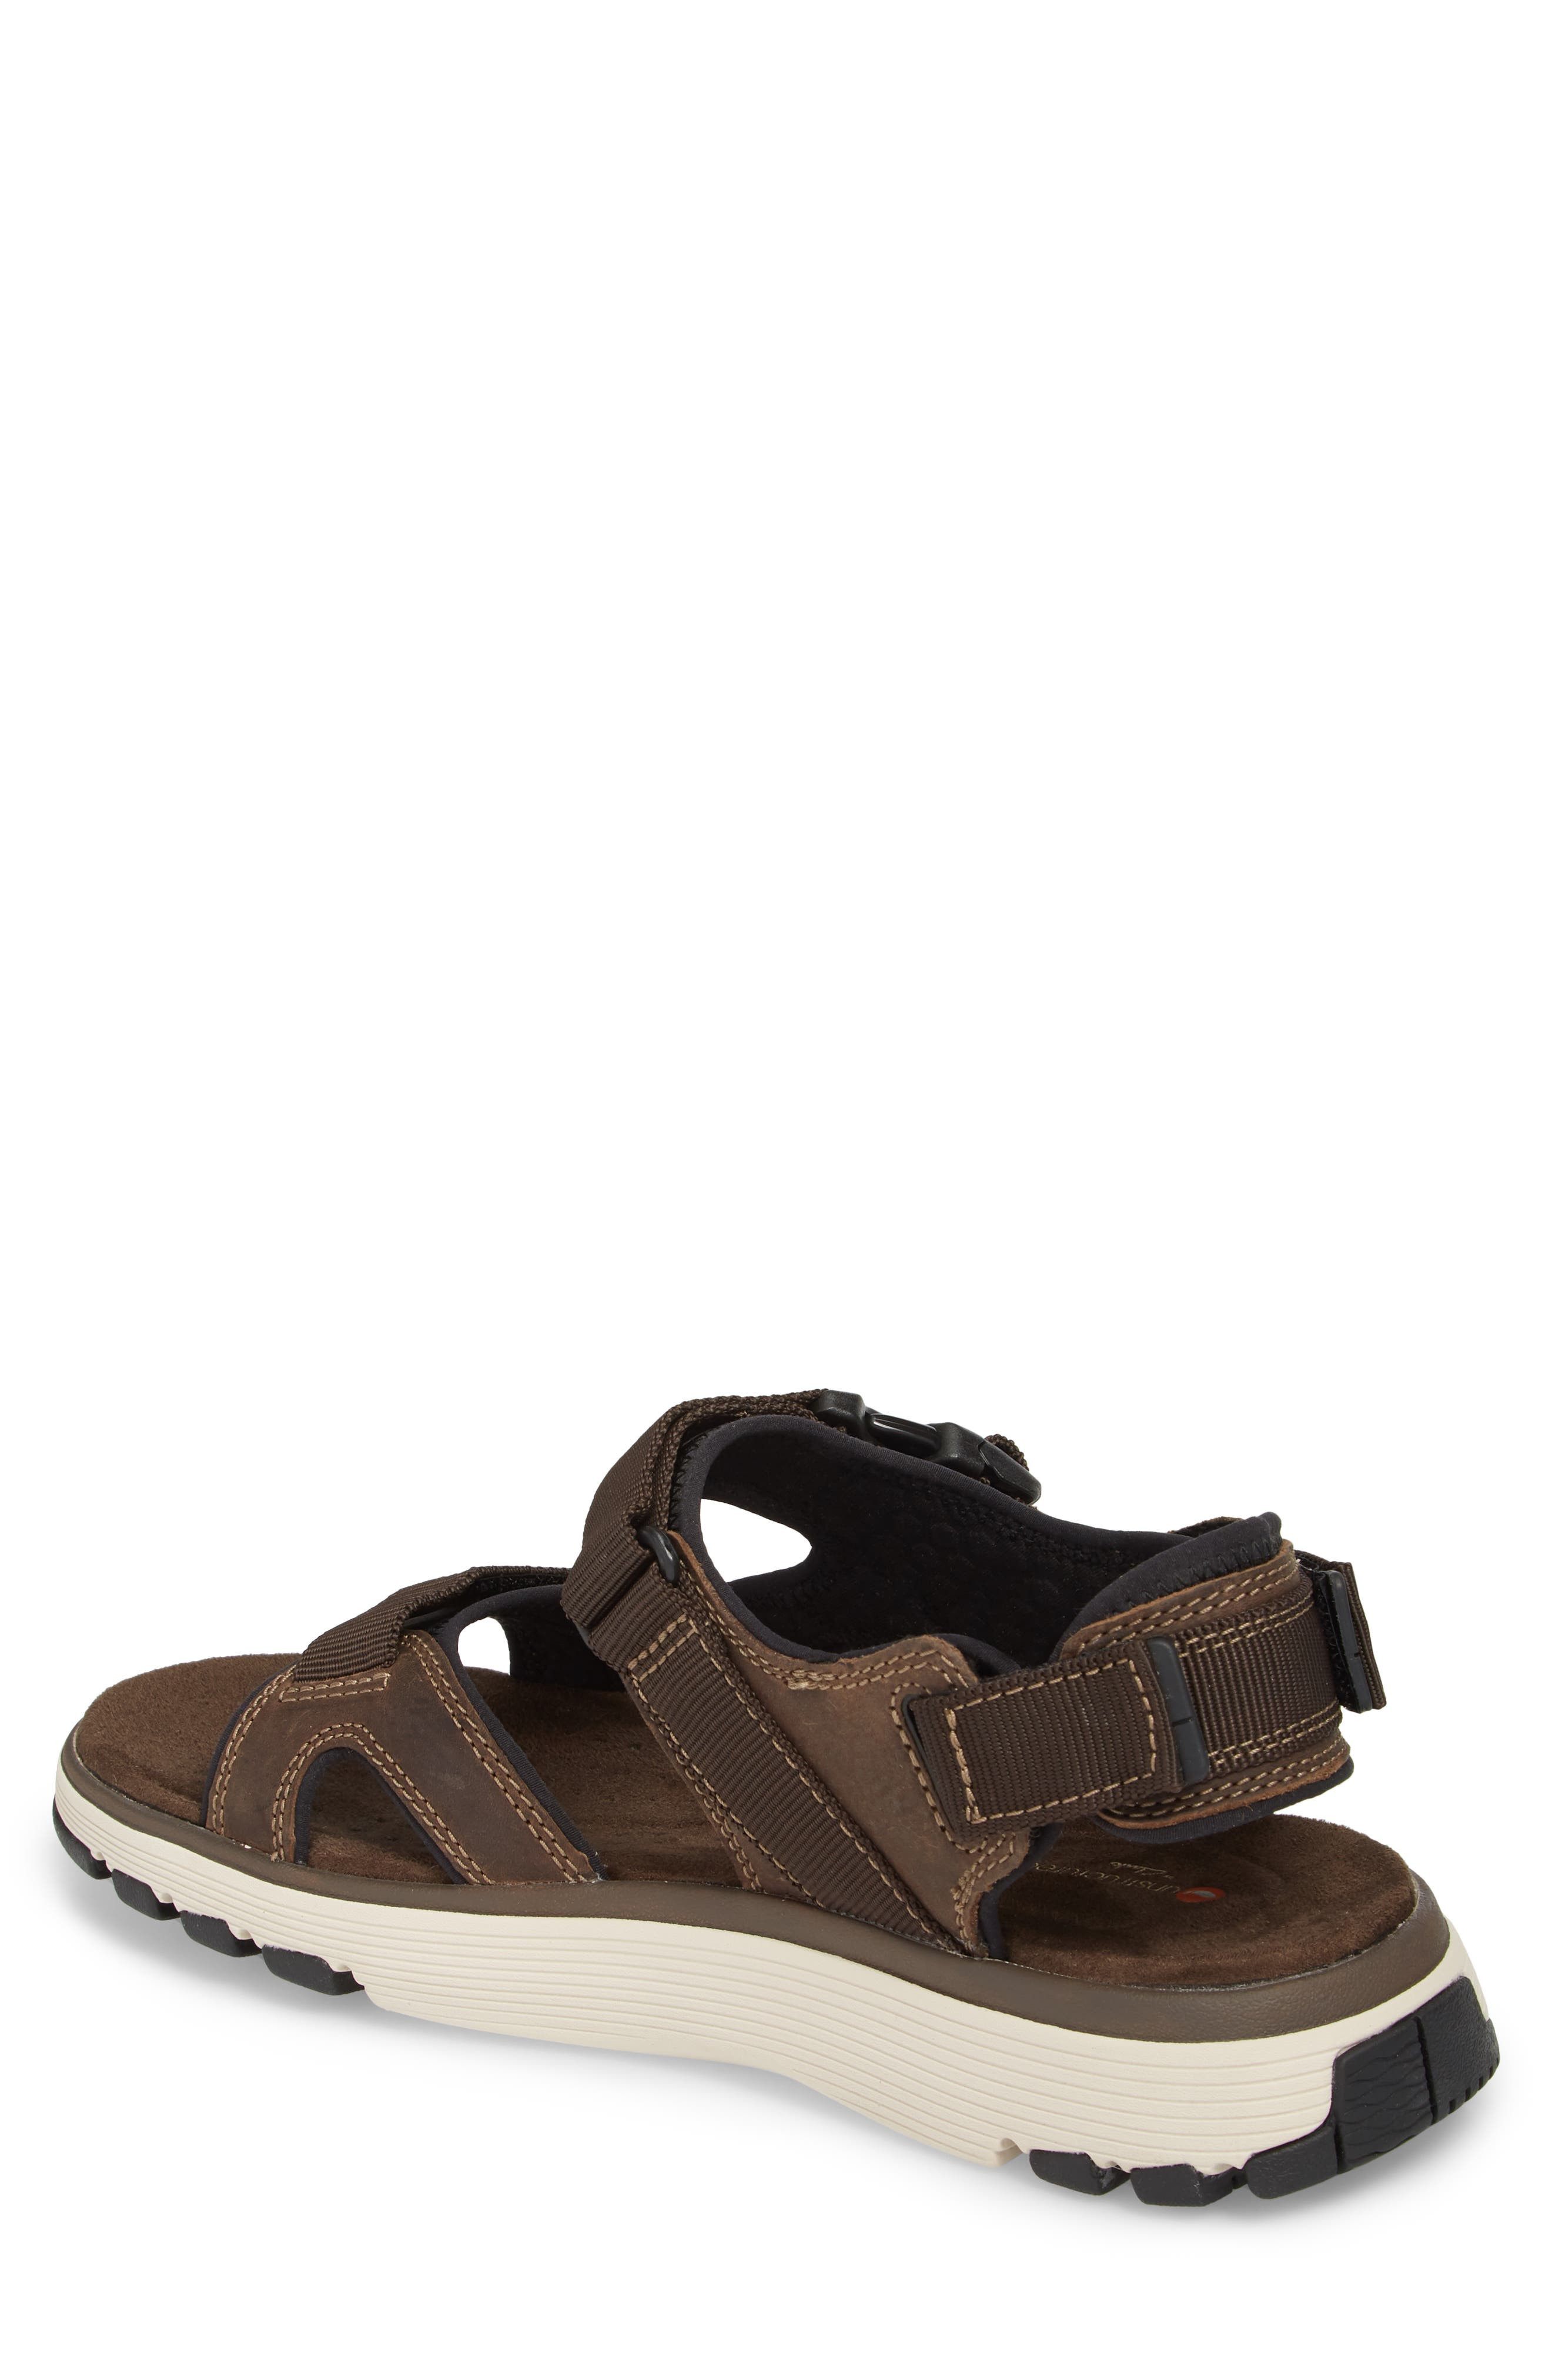 428e3820b719 All Men s Sandals  Sale